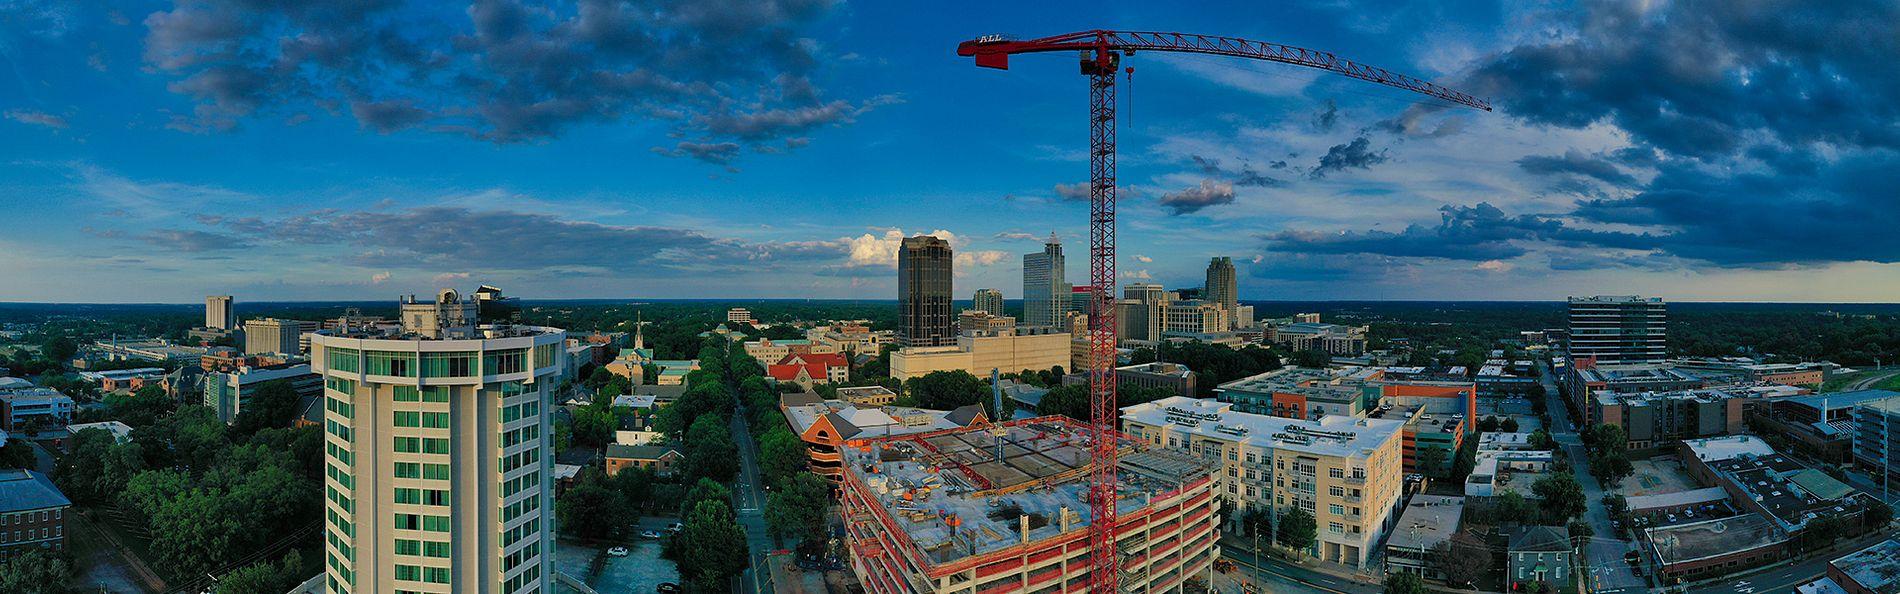 301 Hillsborough Office Building Drone Photo under construction - June 2020